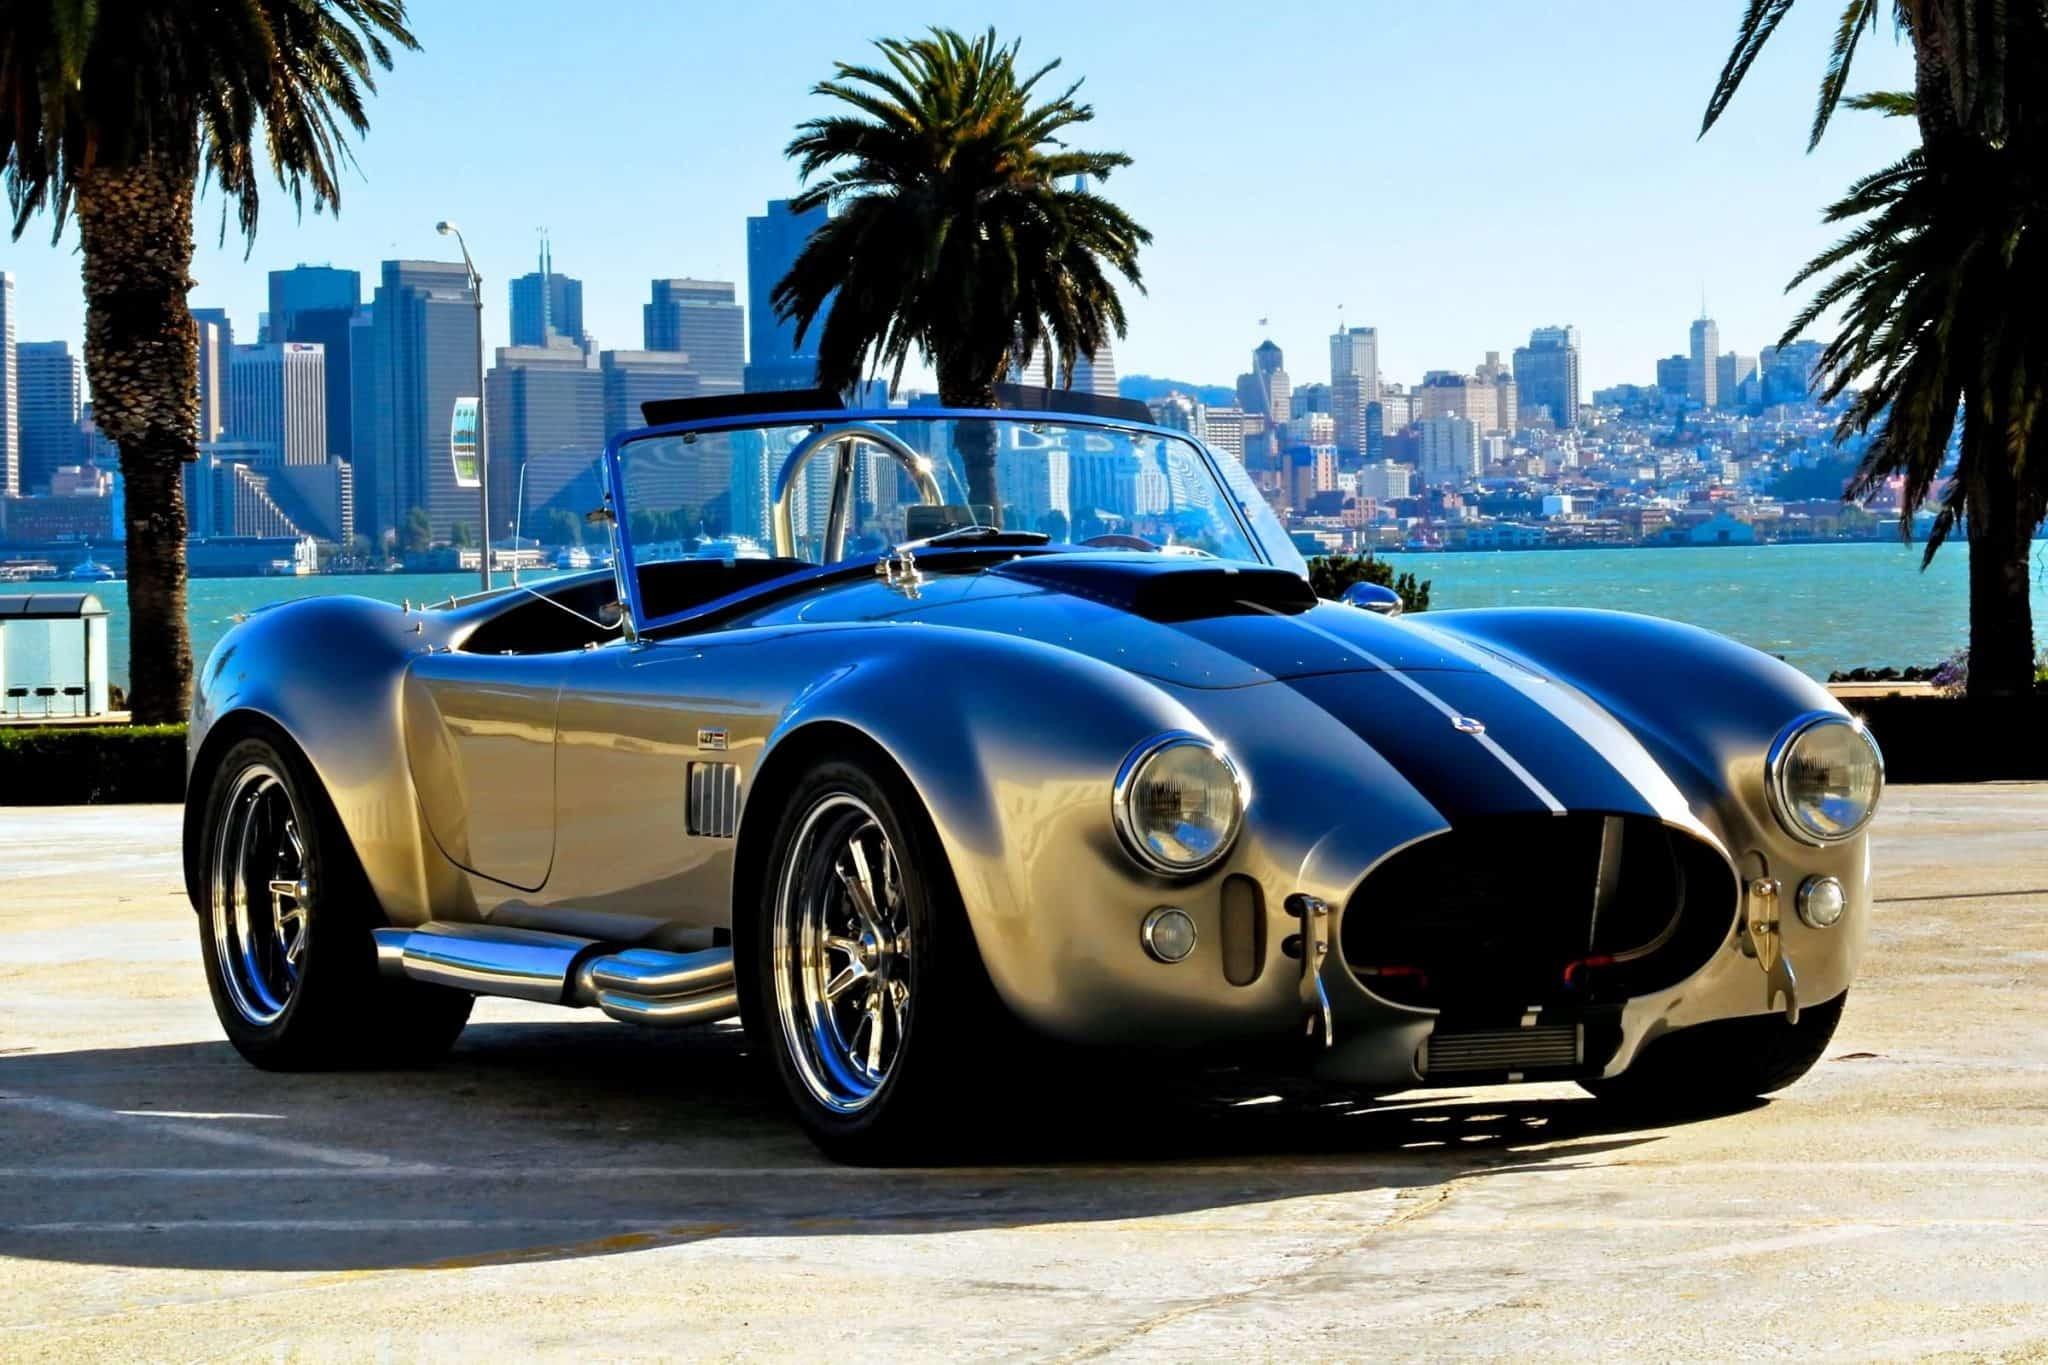 Car Transport Los Angeles | Car Shipping Los Angeles